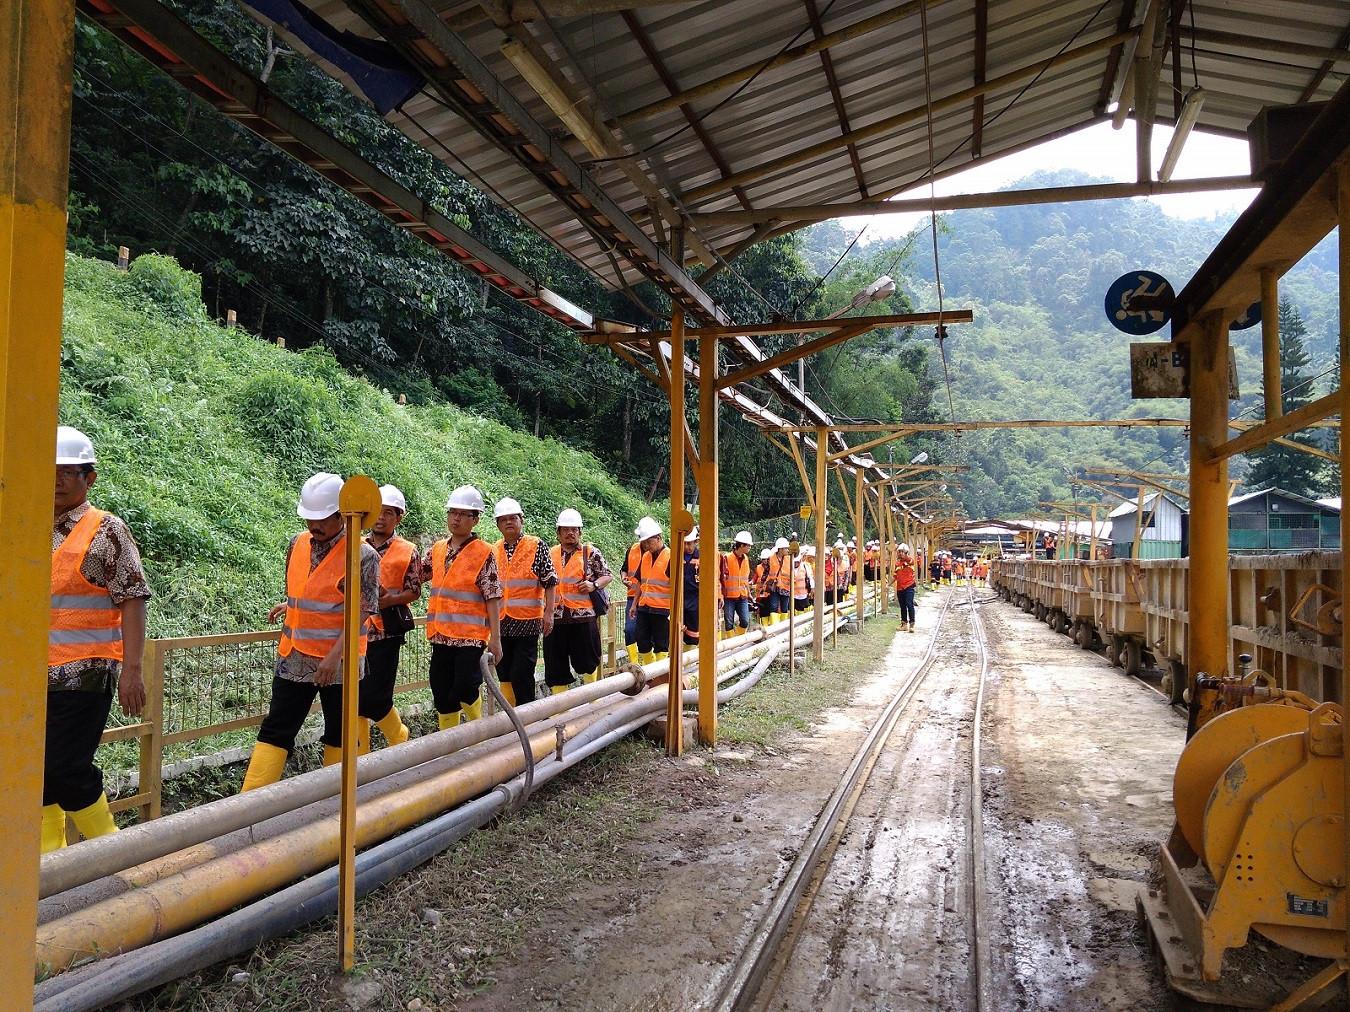 Visitors walk past a mining area.